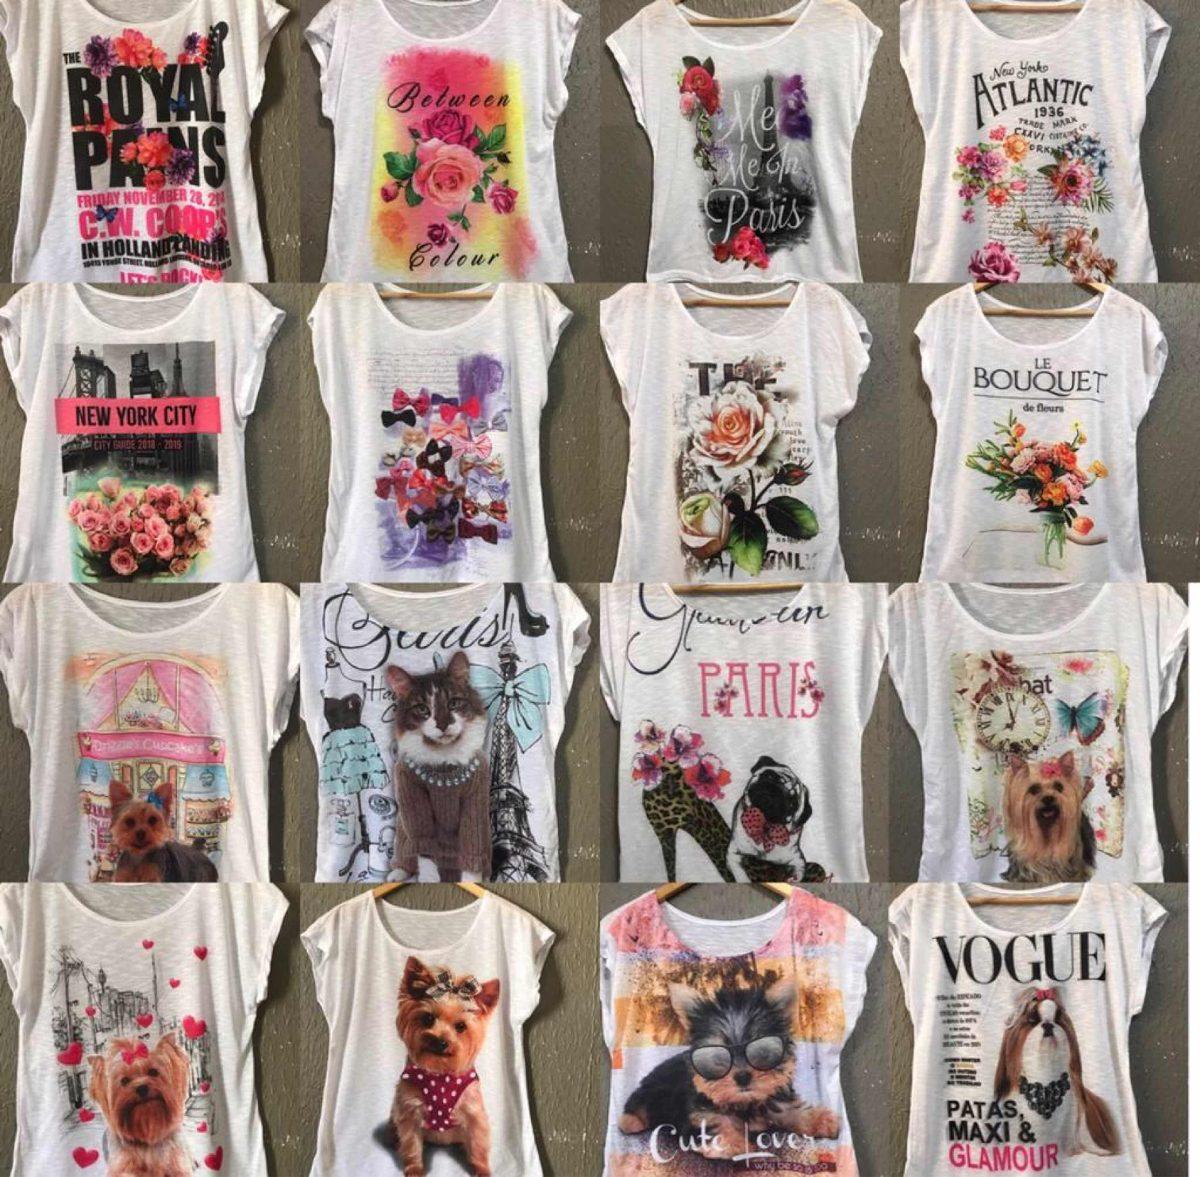 38799ba91f blusa feminina atacado revenda kit tshirt 13 variadas. Carregando zoom.